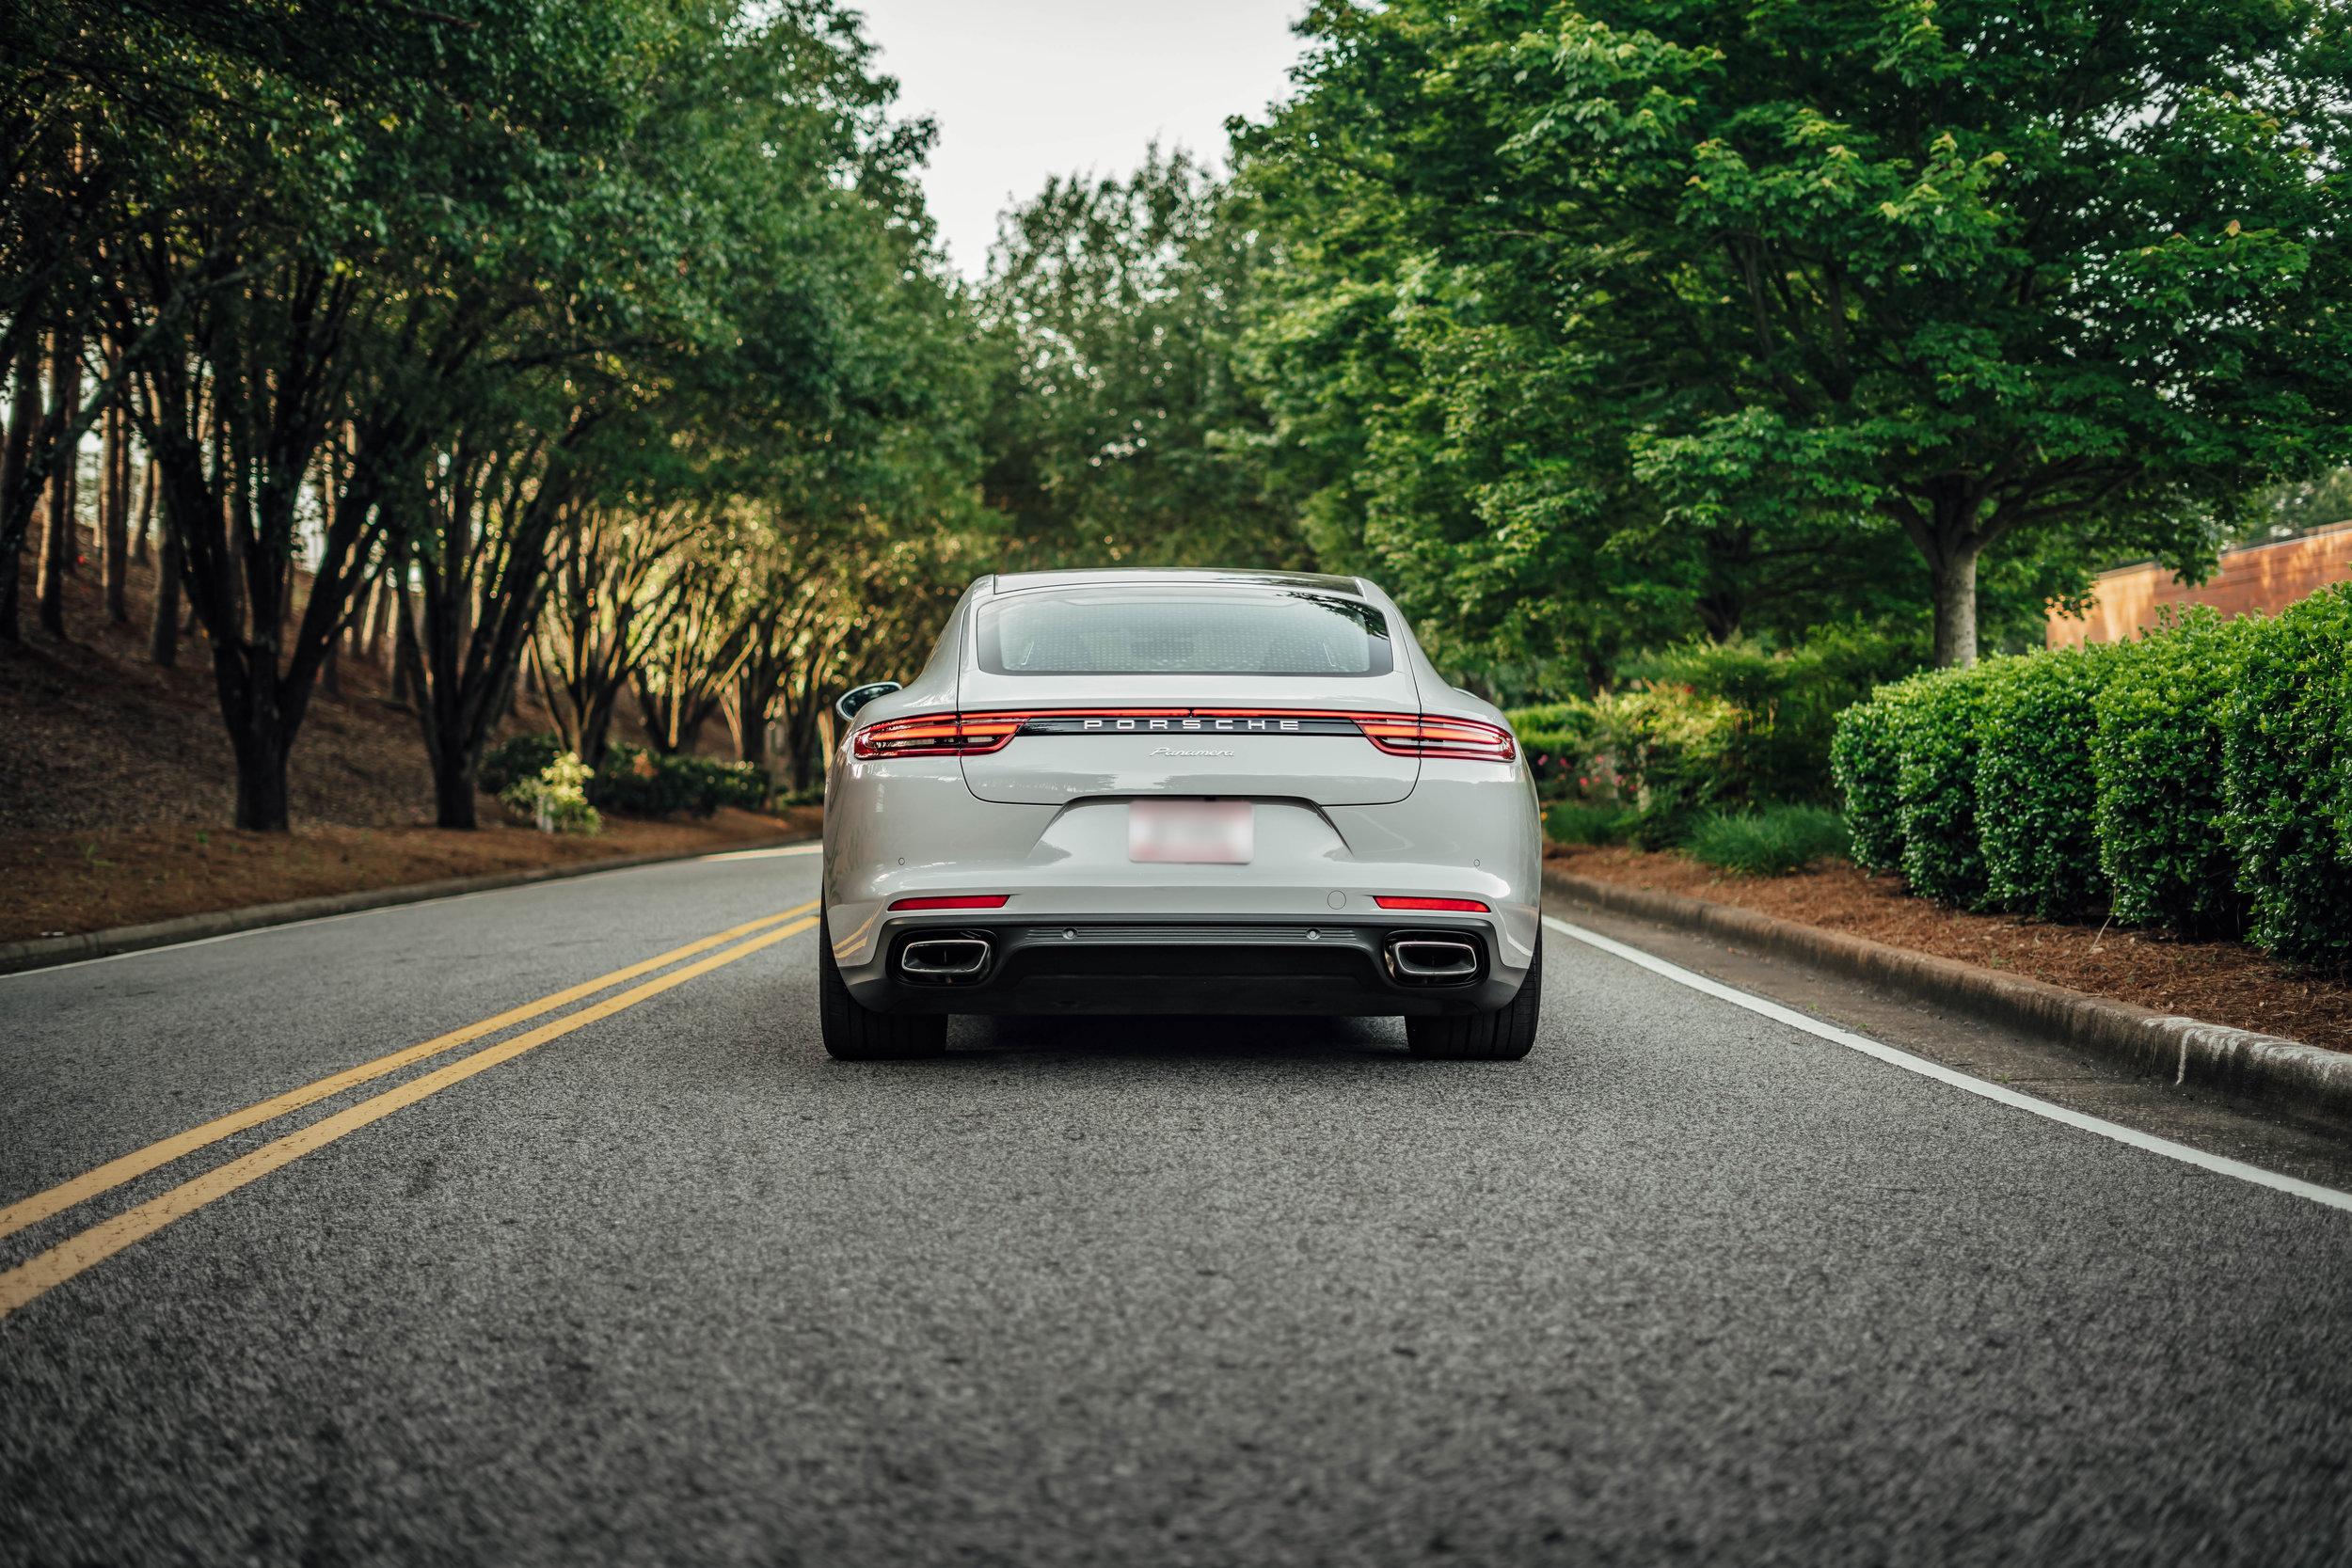 20190504 Porsche-13 Blur.jpg